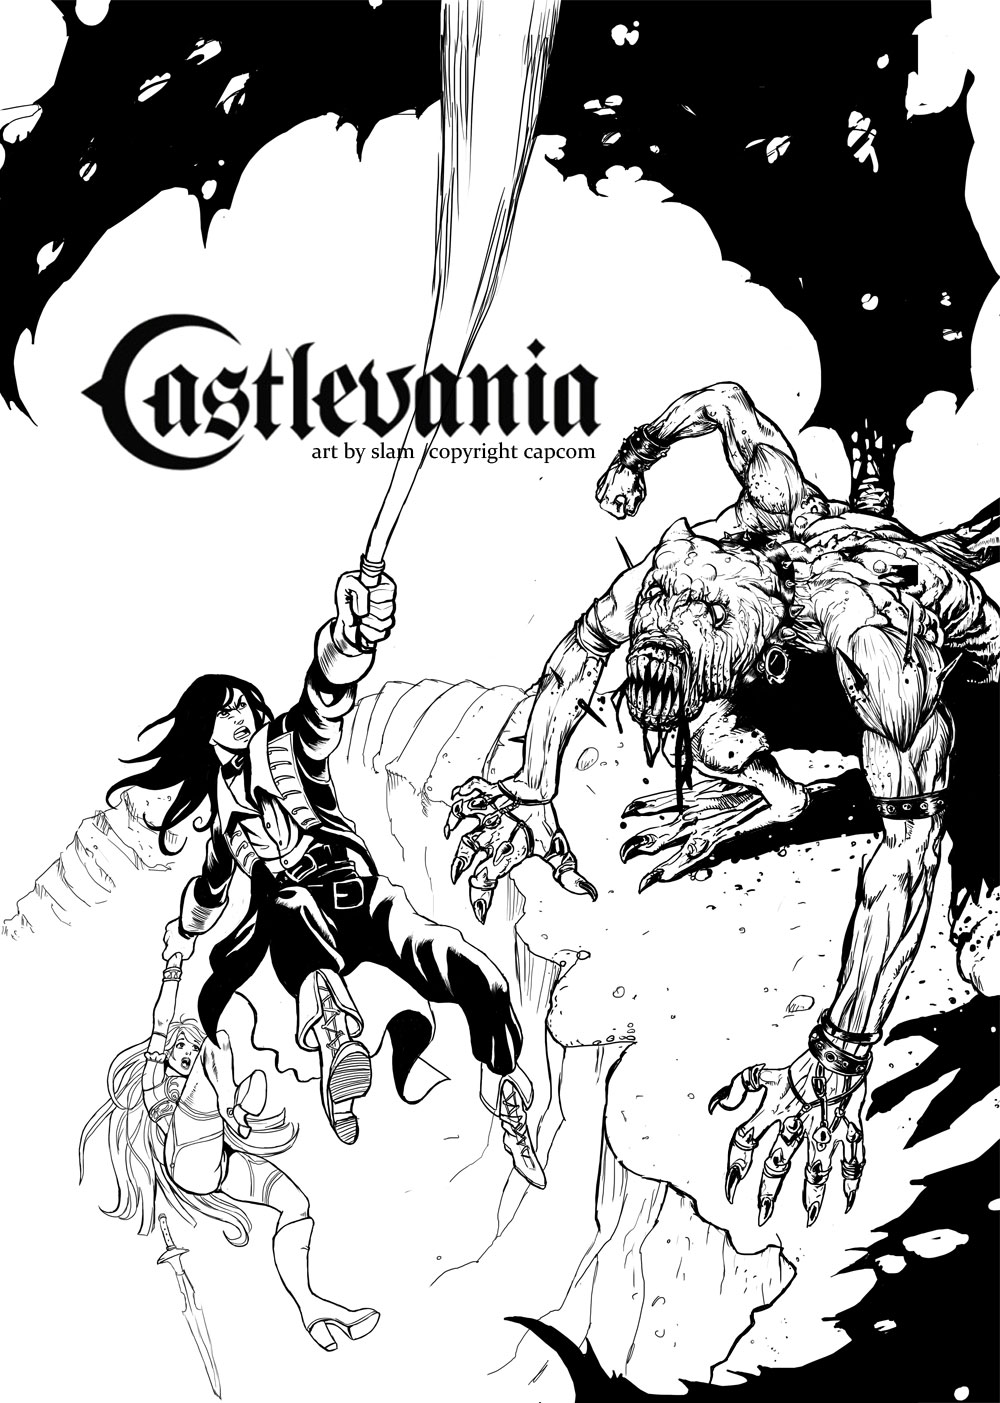 Castlevania - inks